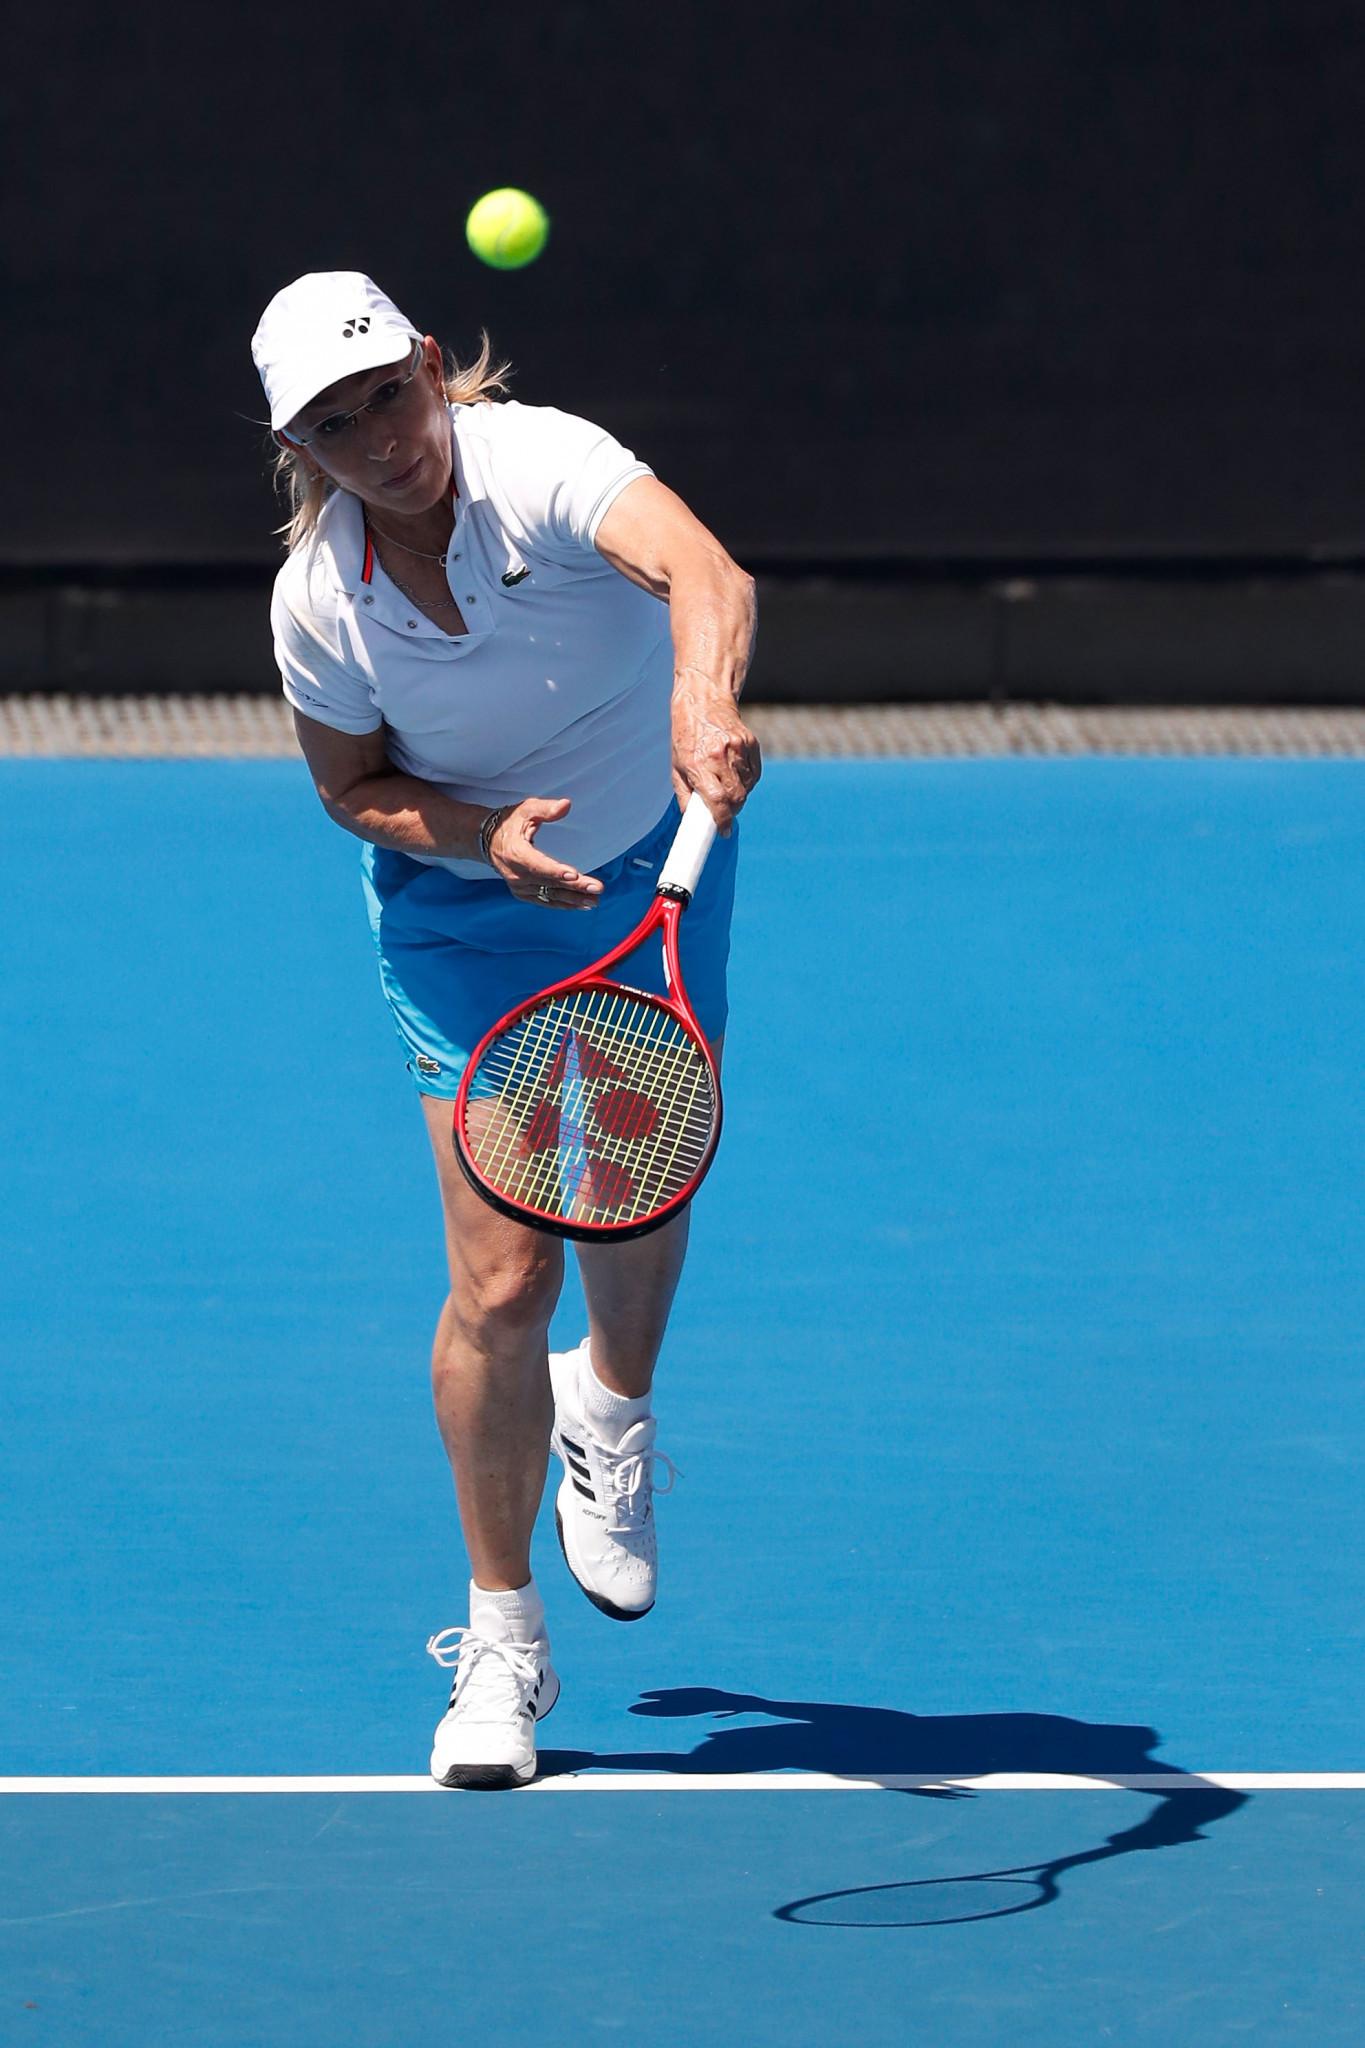 Tennis legend Martina Navratilova has thrown her support behind Caster Semenya ©Getty Images